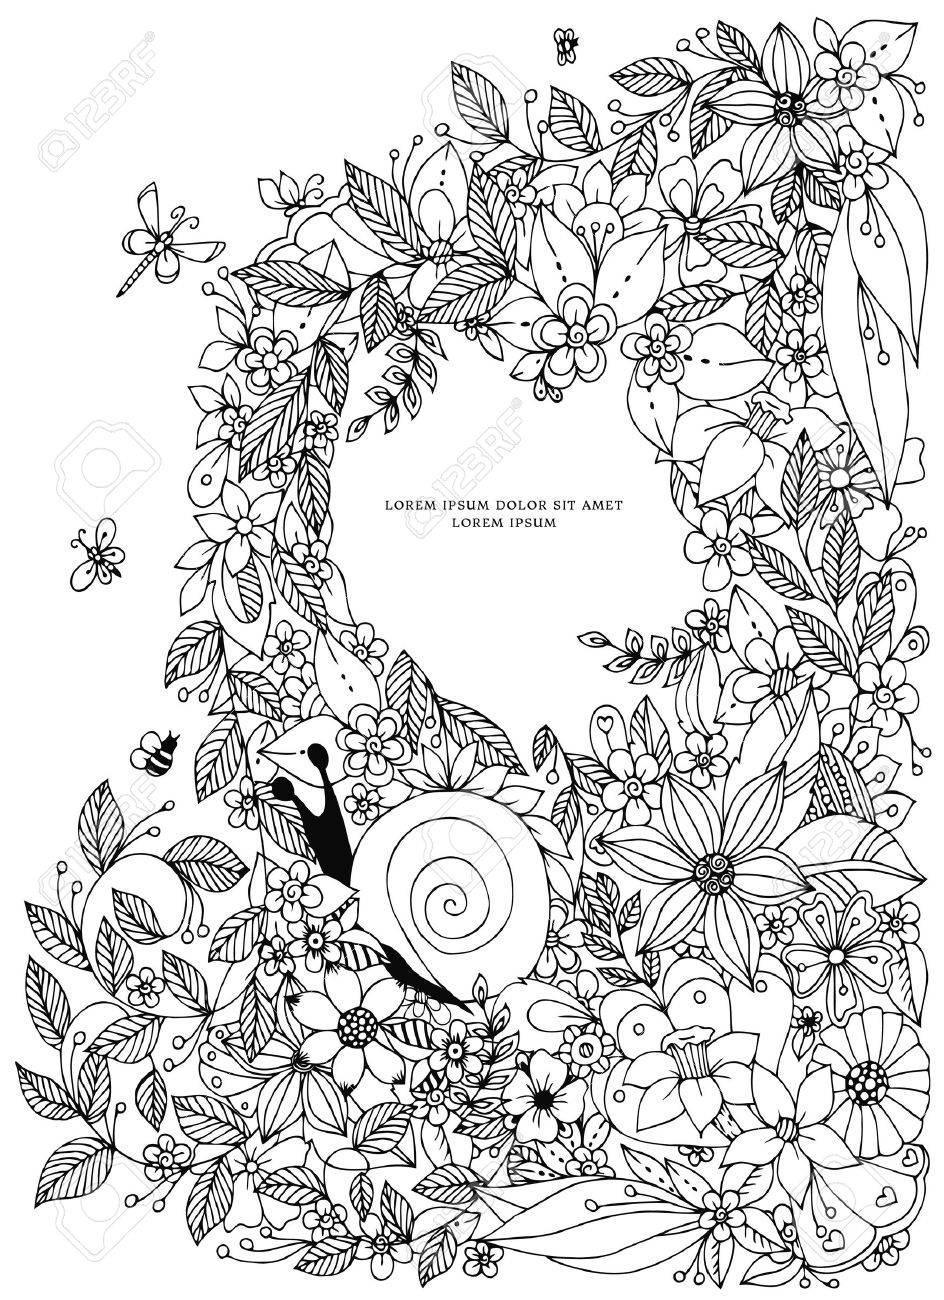 seashell border frame ocean pattern vintage illustration